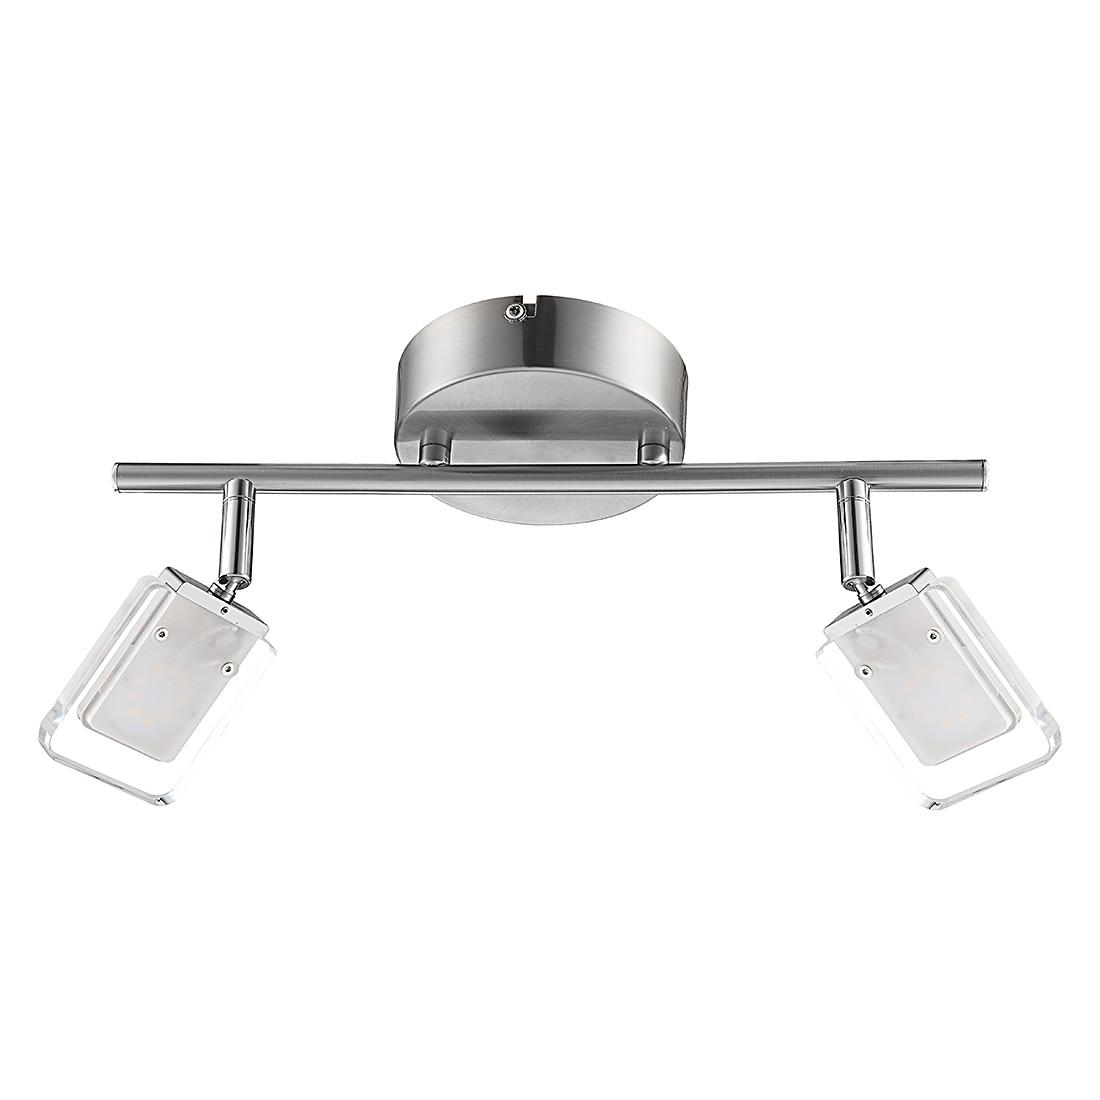 energie  A+, Plafondlamp VILETA - metaal/glas 2 lichtbronnen, Wofi